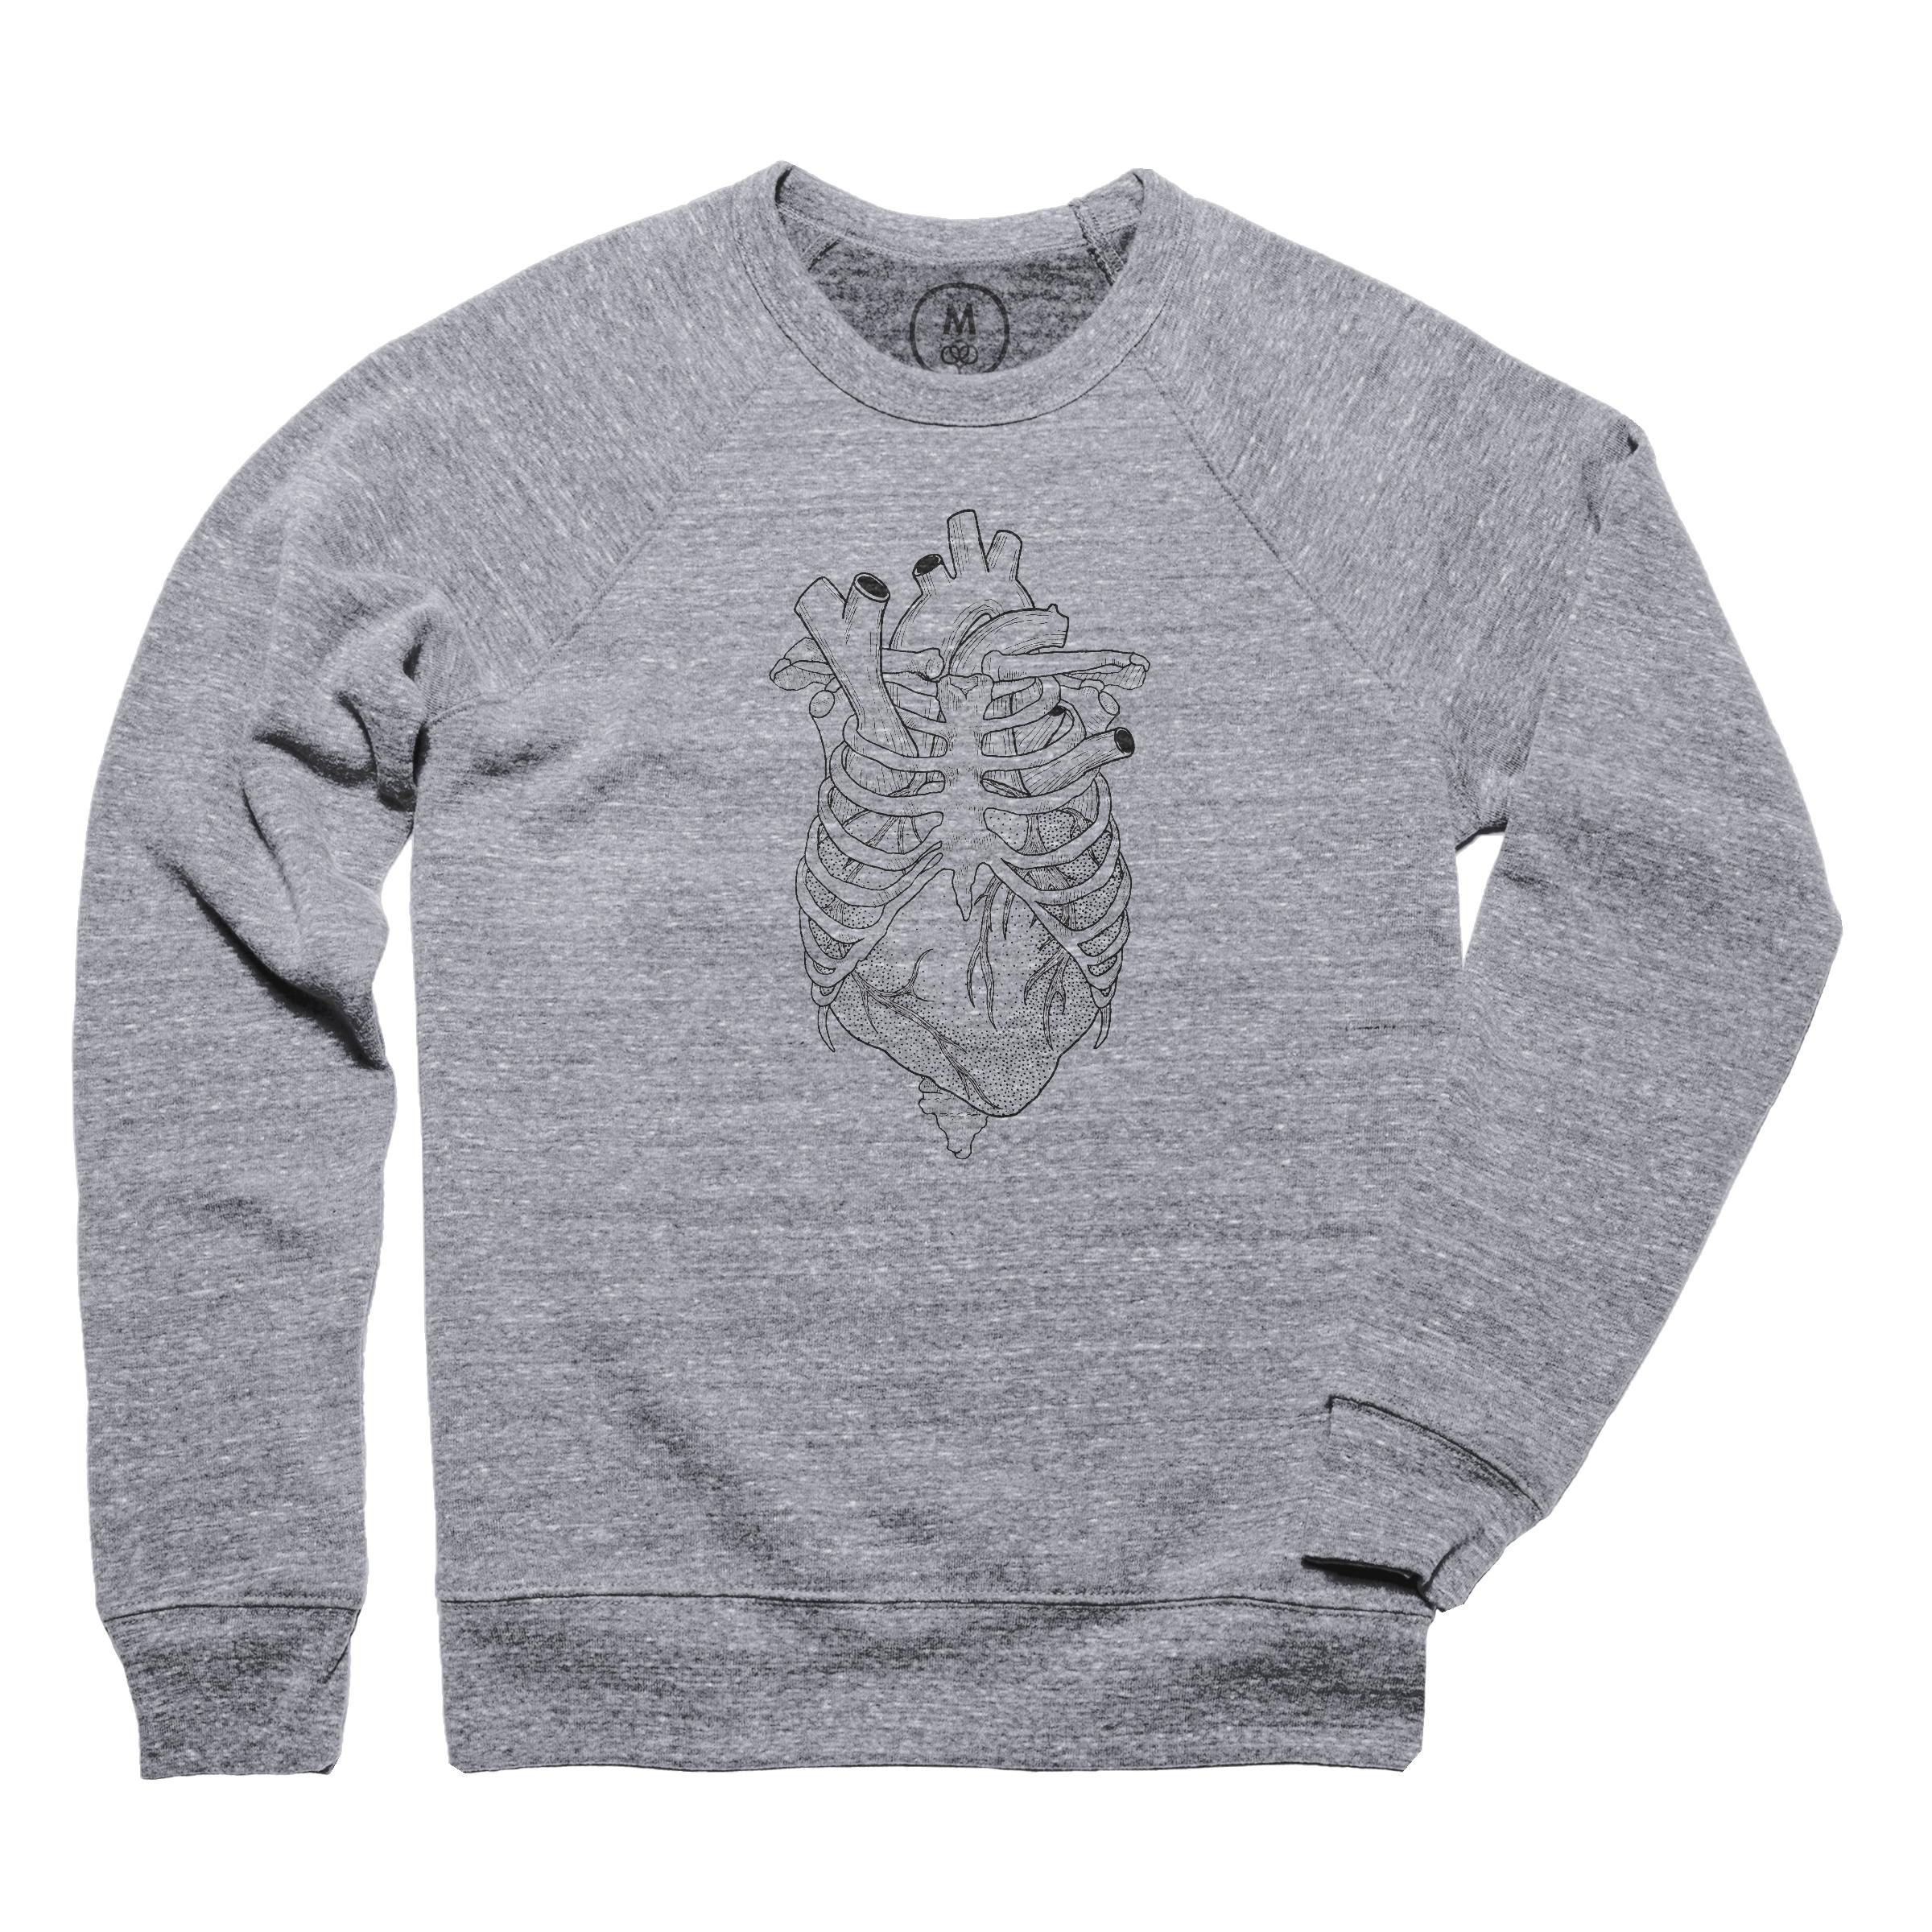 All Heart Pullover Crewneck